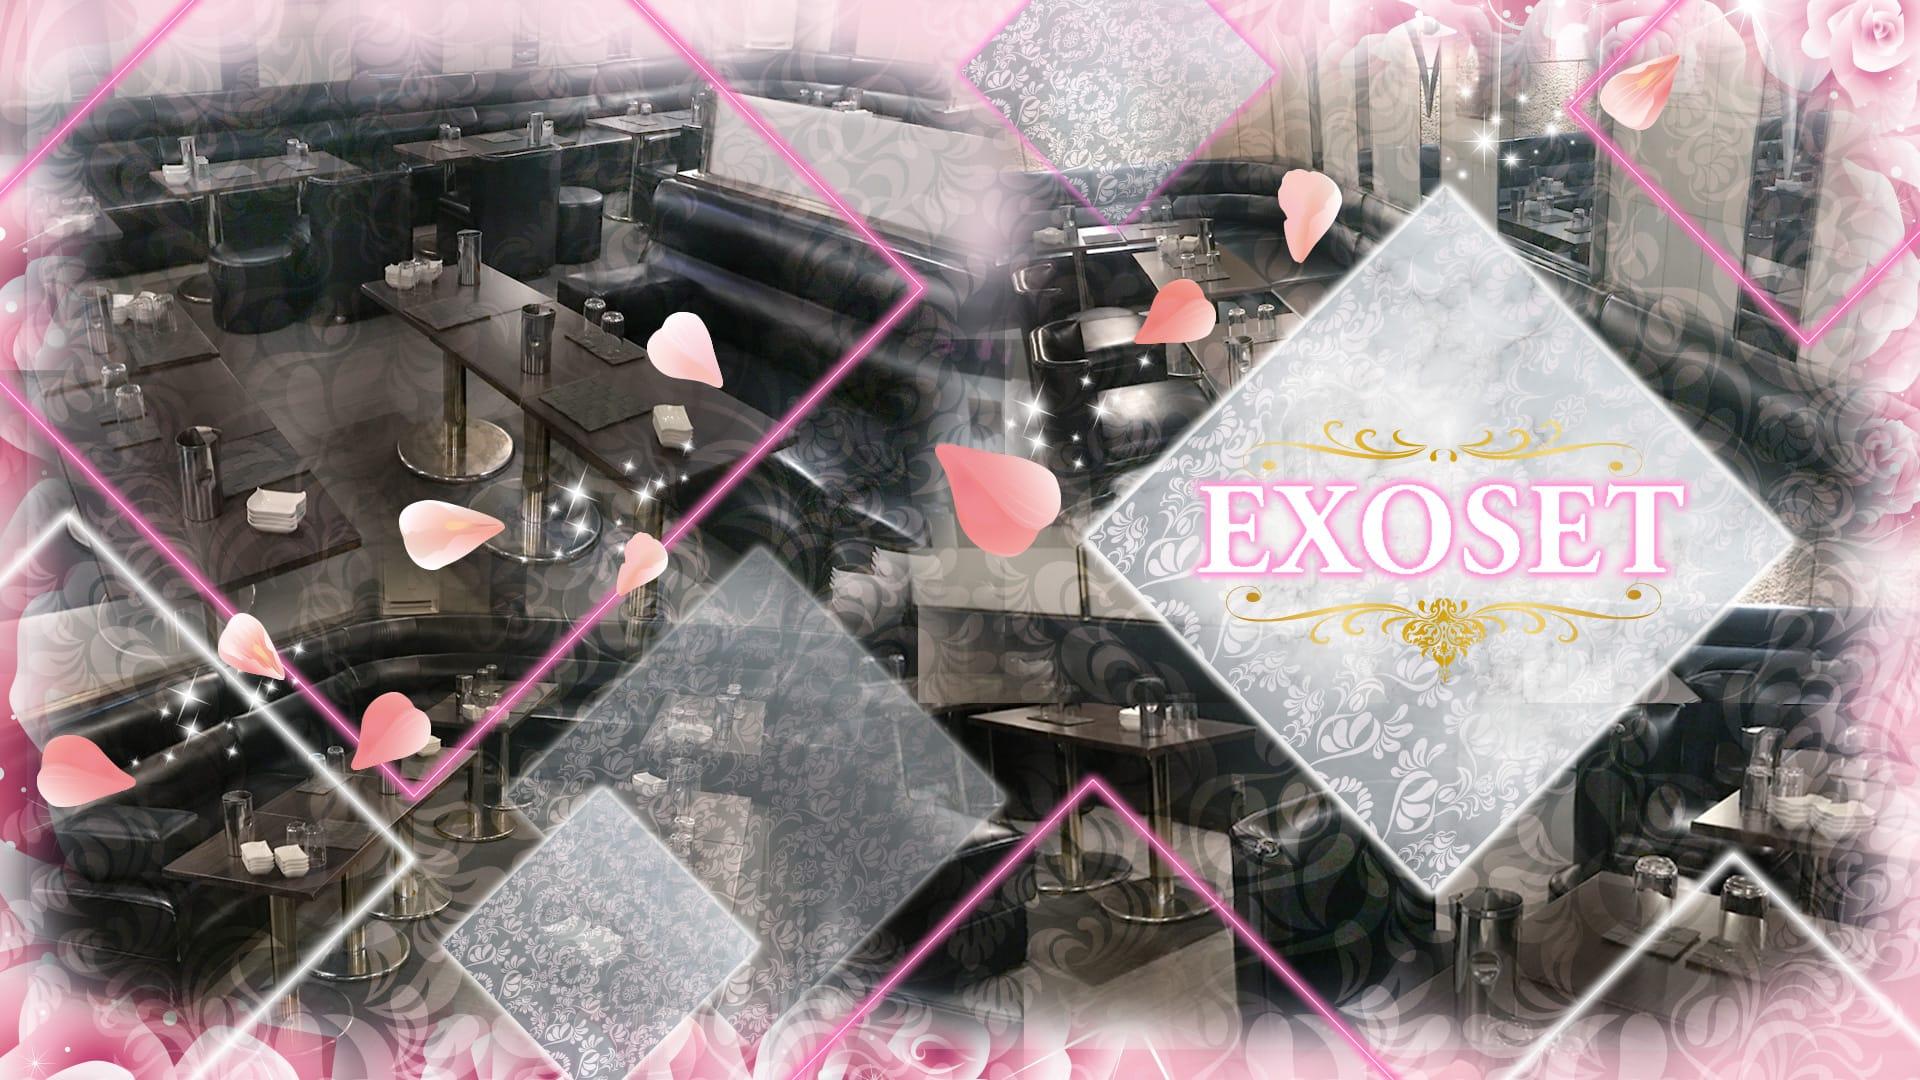 EXOSET(エグゾセ) 池袋キャバクラ TOP画像